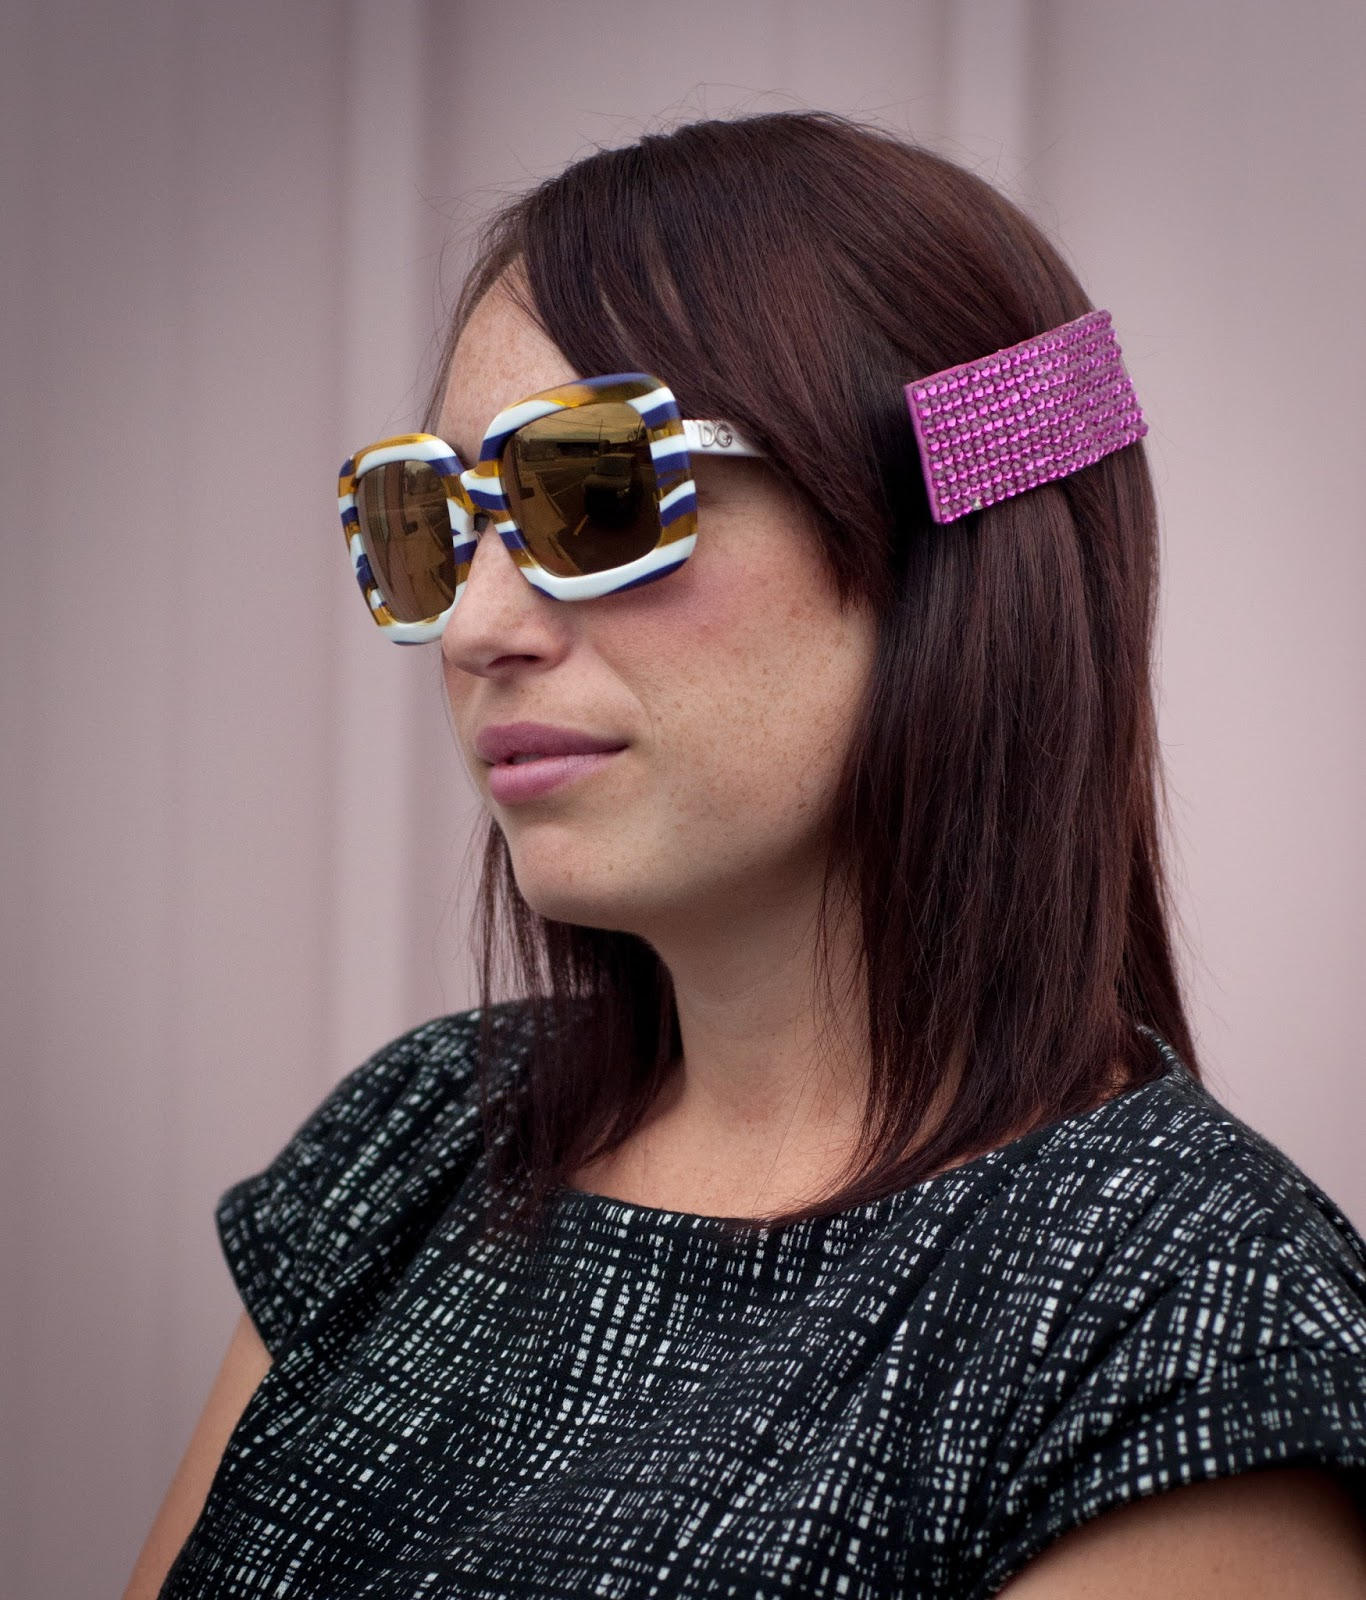 dolce and gabbana sunglasses, ootd, unique sunglasses, calvin klein dress, hair clip,